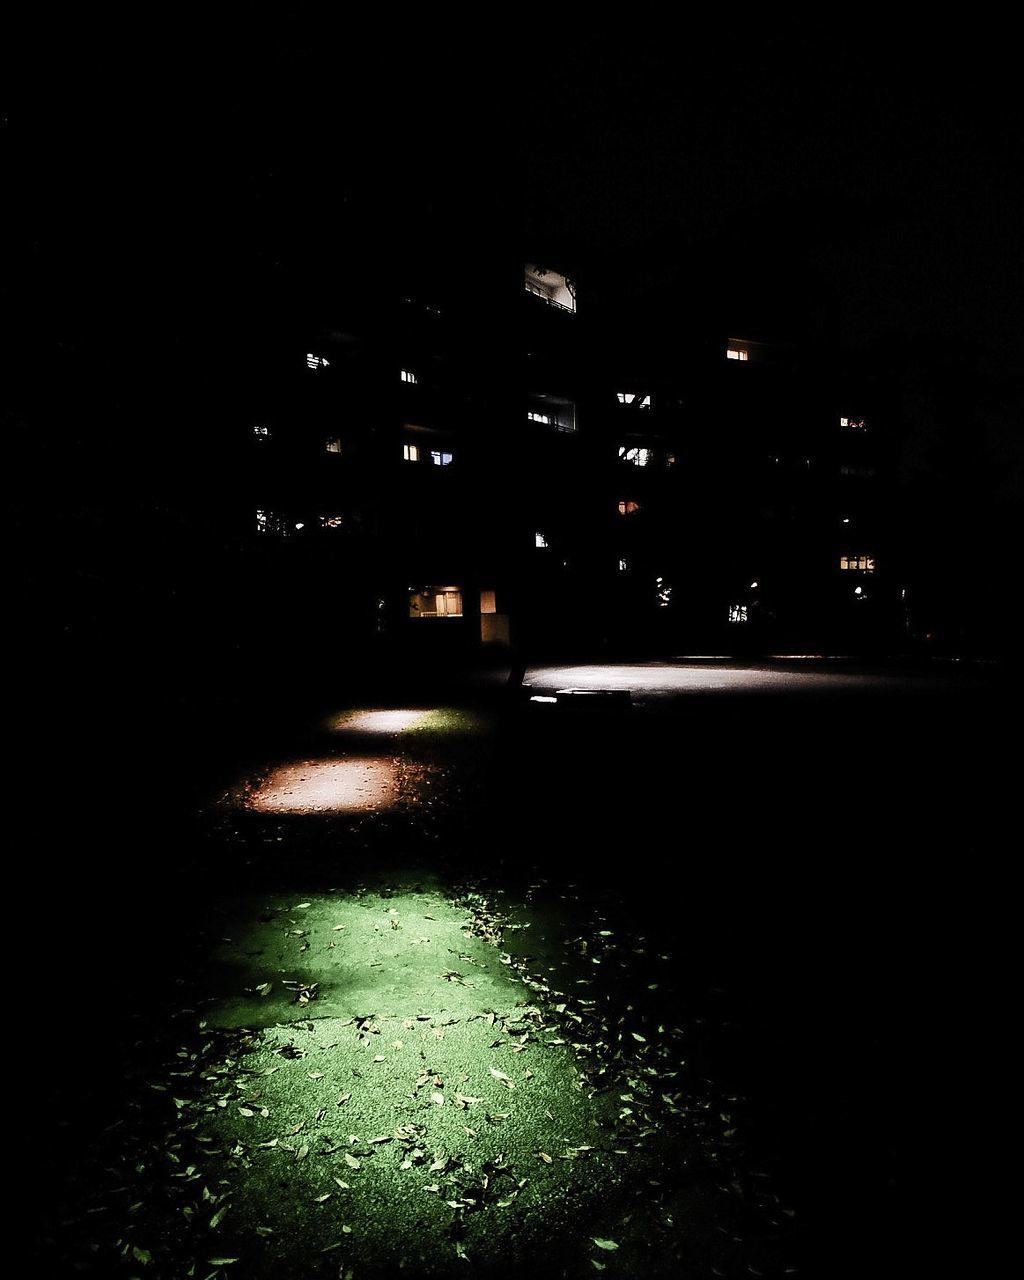 night, illuminated, no people, water, outdoors, architecture